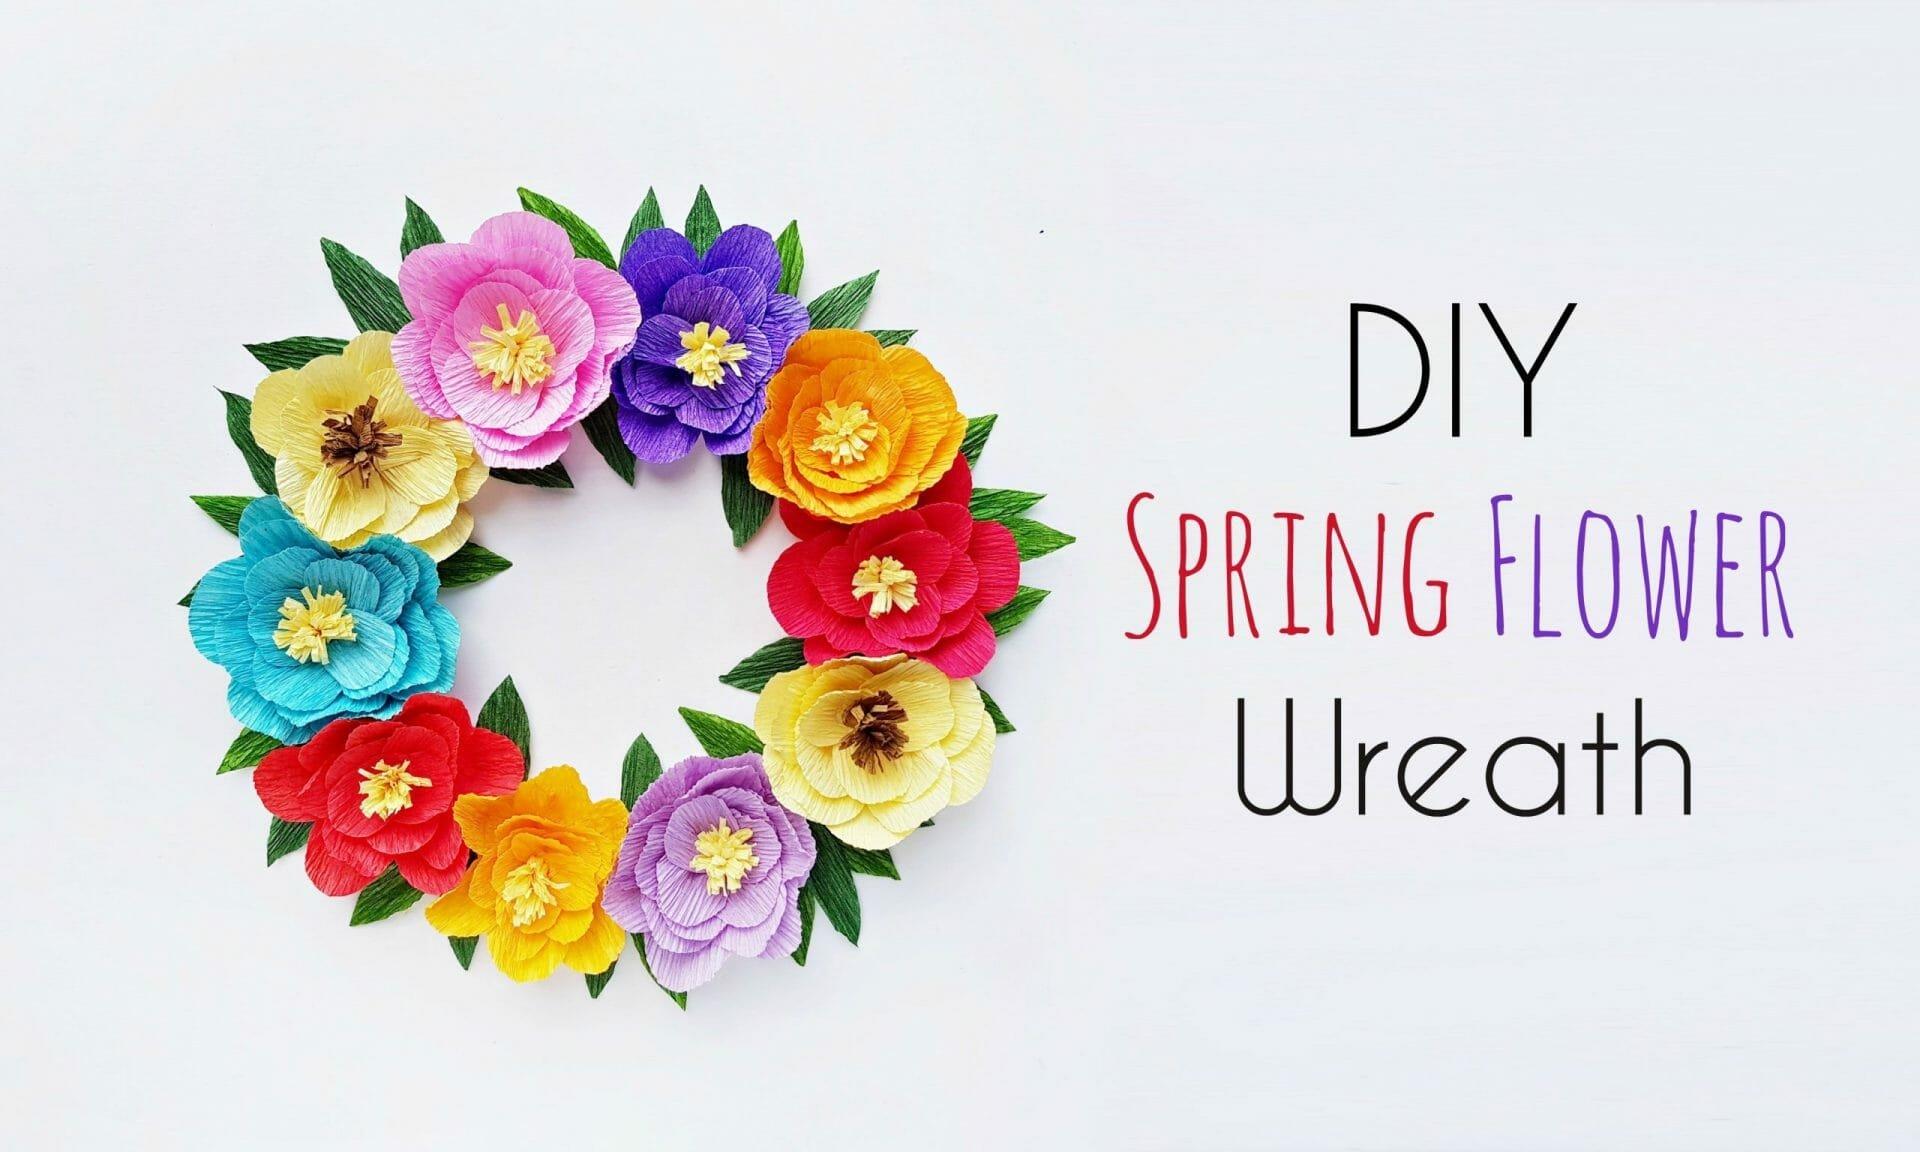 DIY Spring Flower Wreath